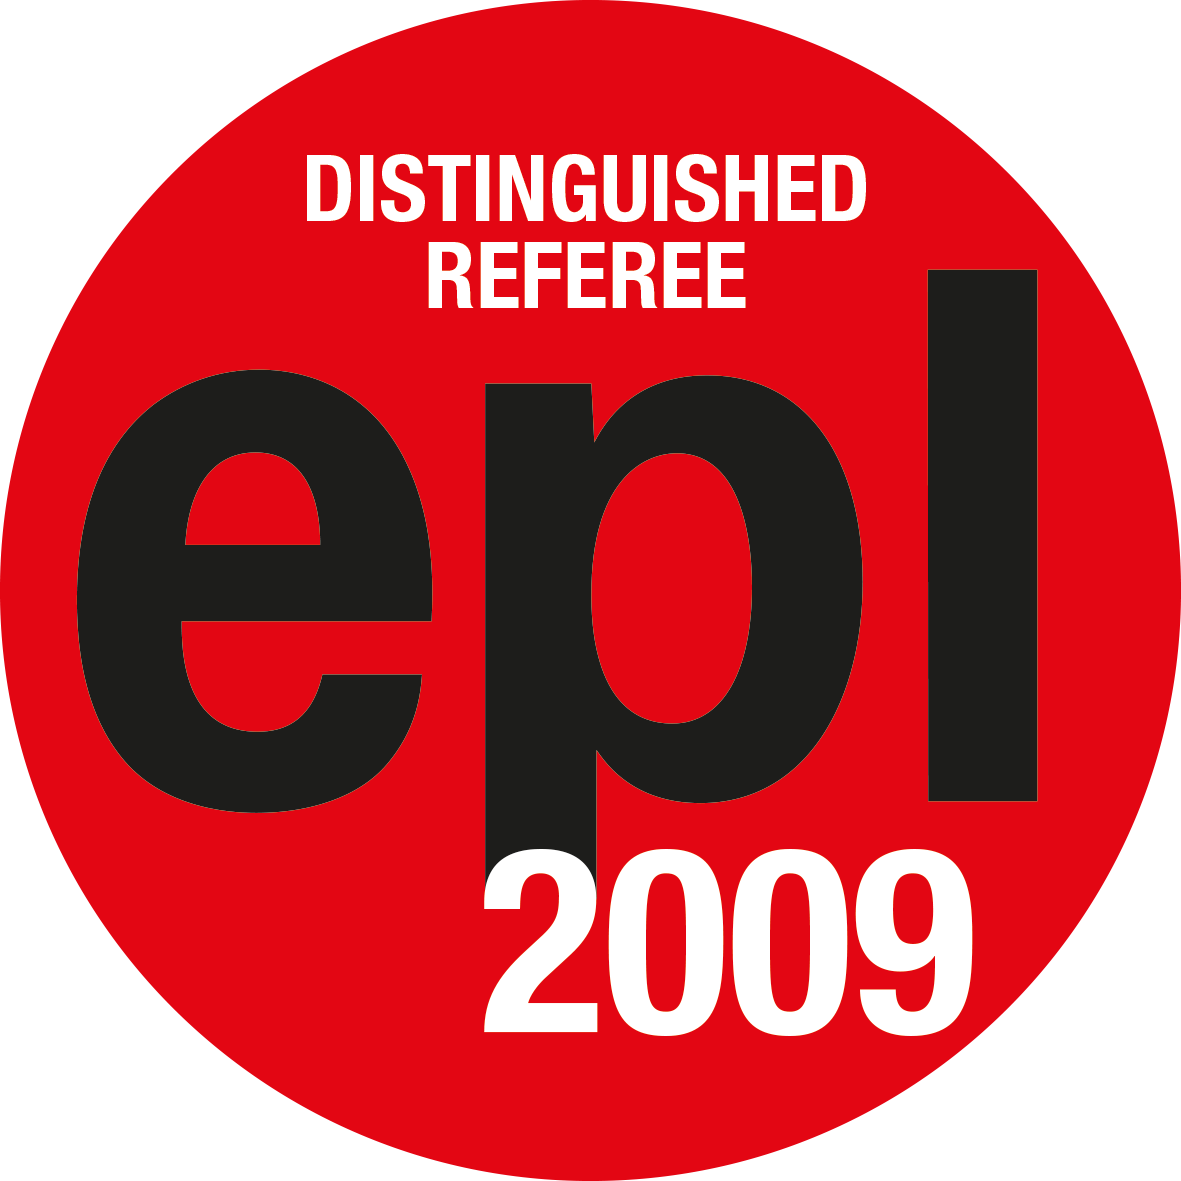 EPL Distinguished Referees 2009